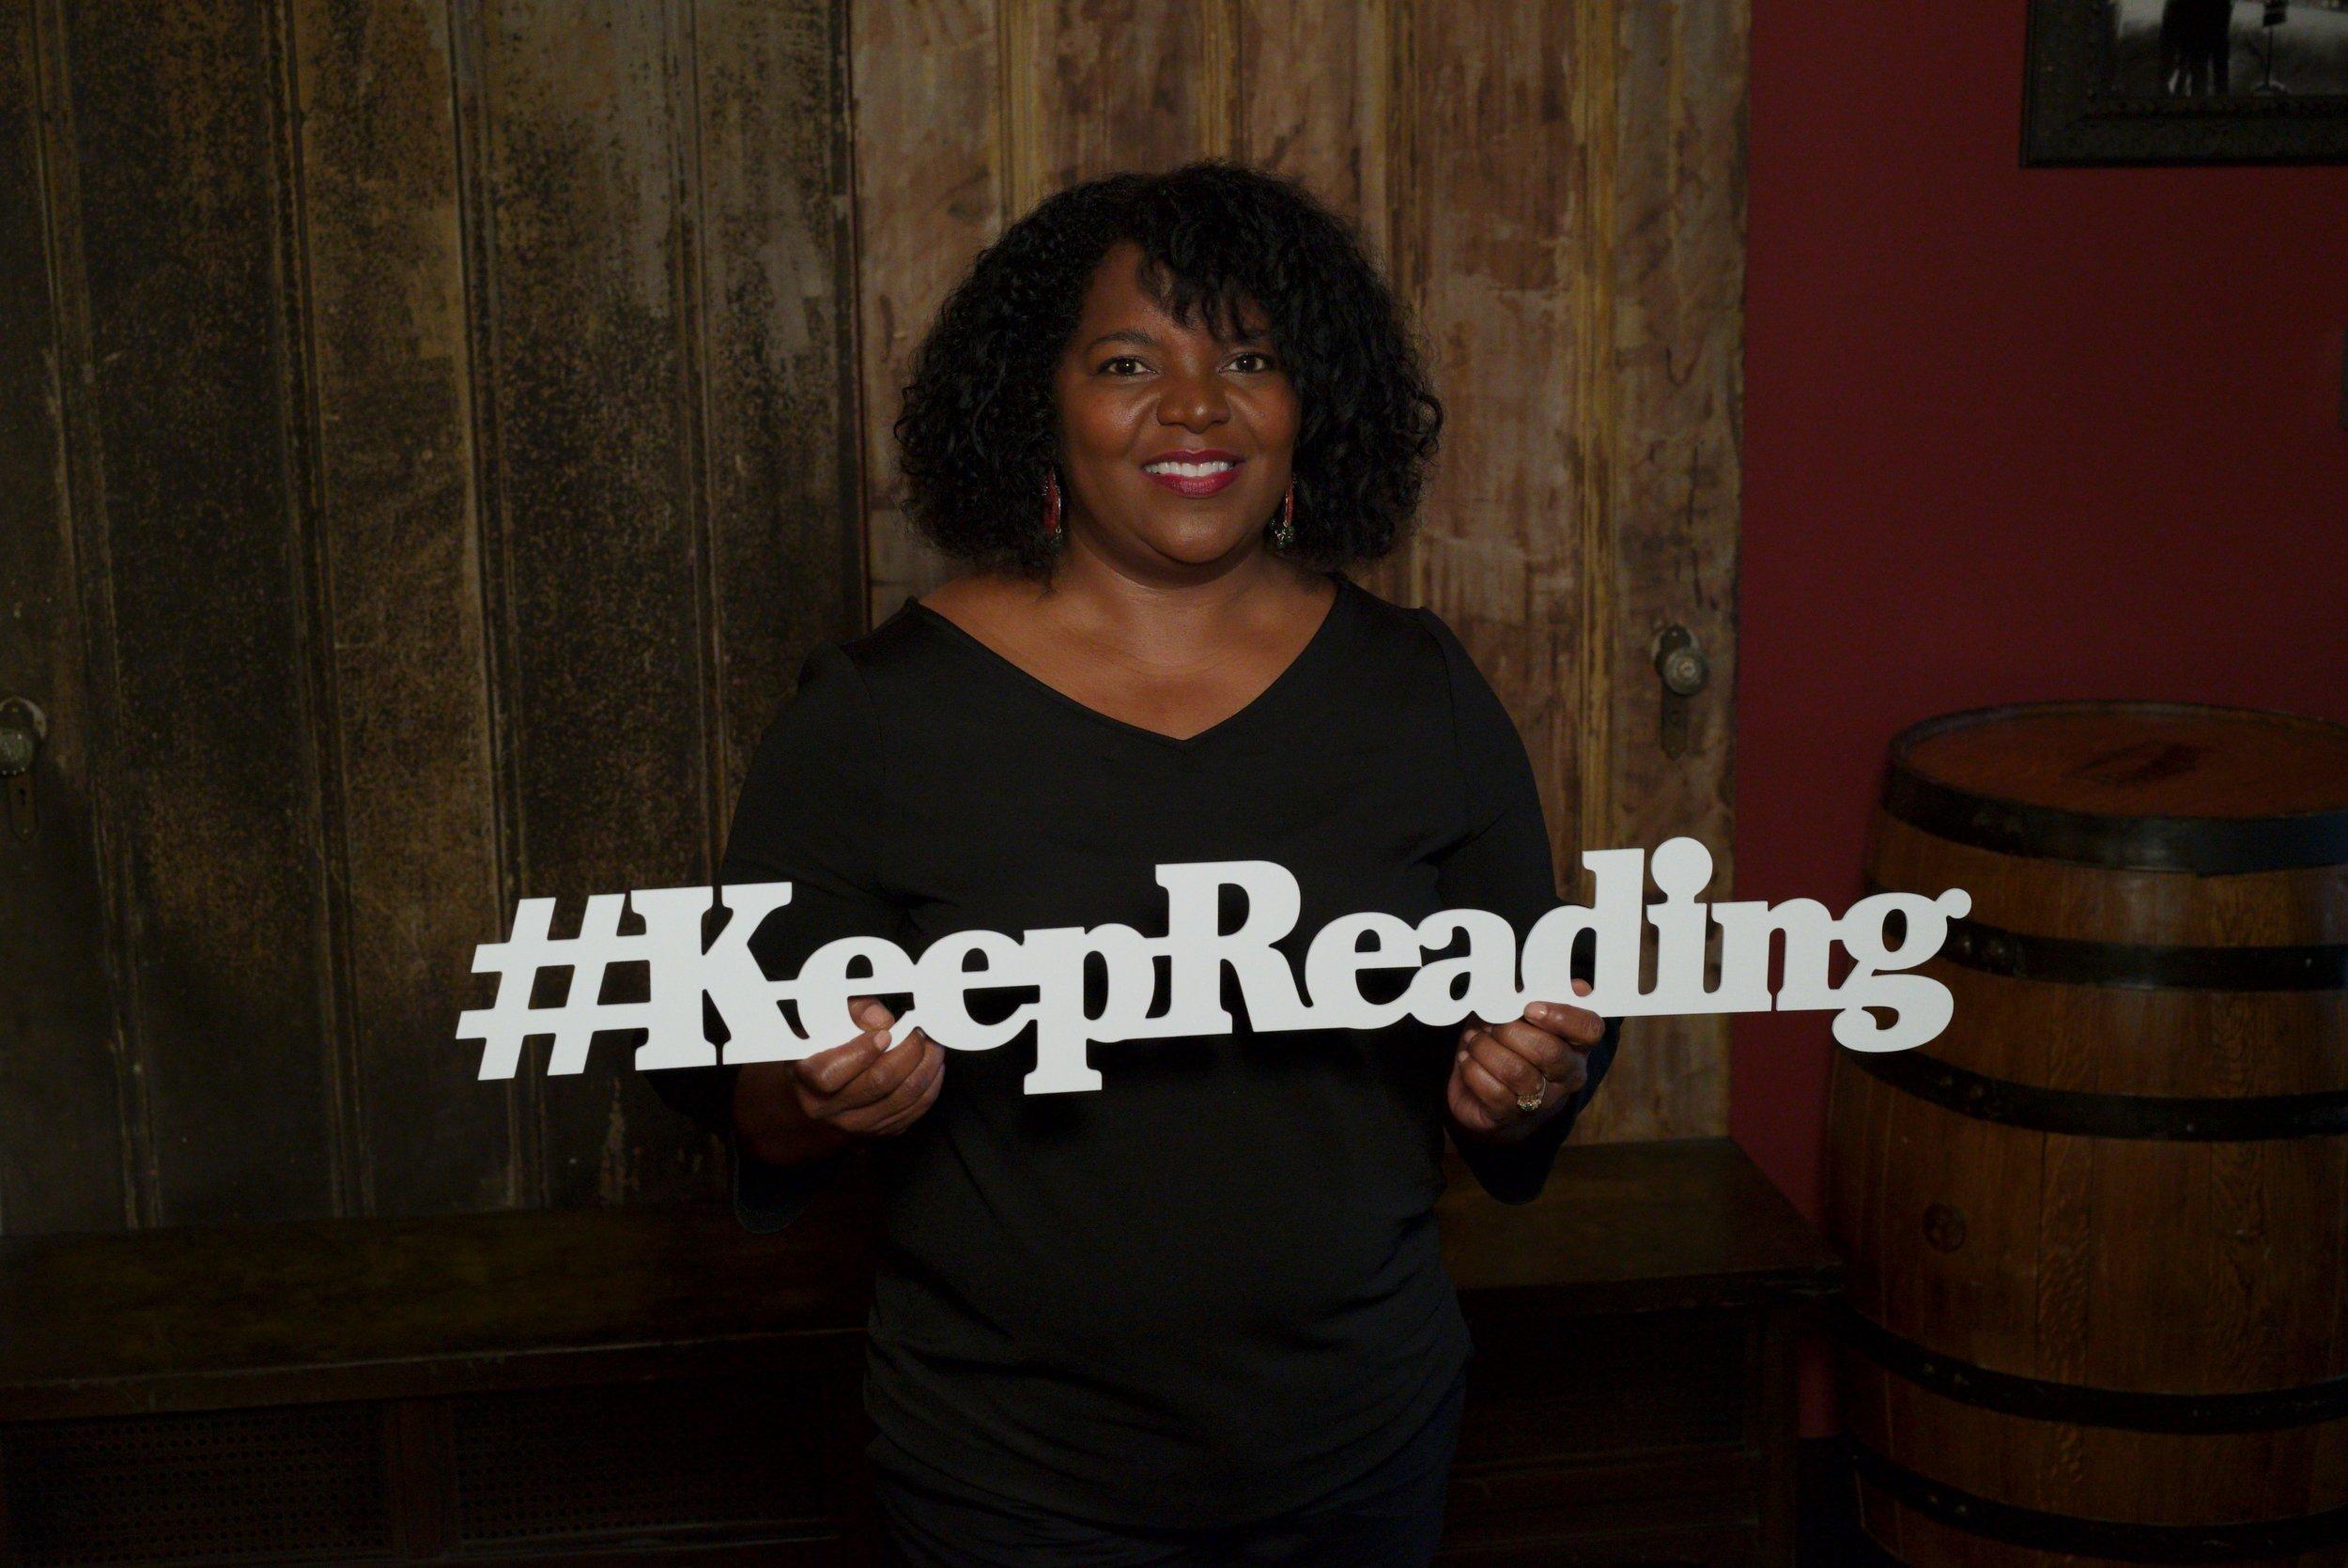 Steph Keep Reading.jpg